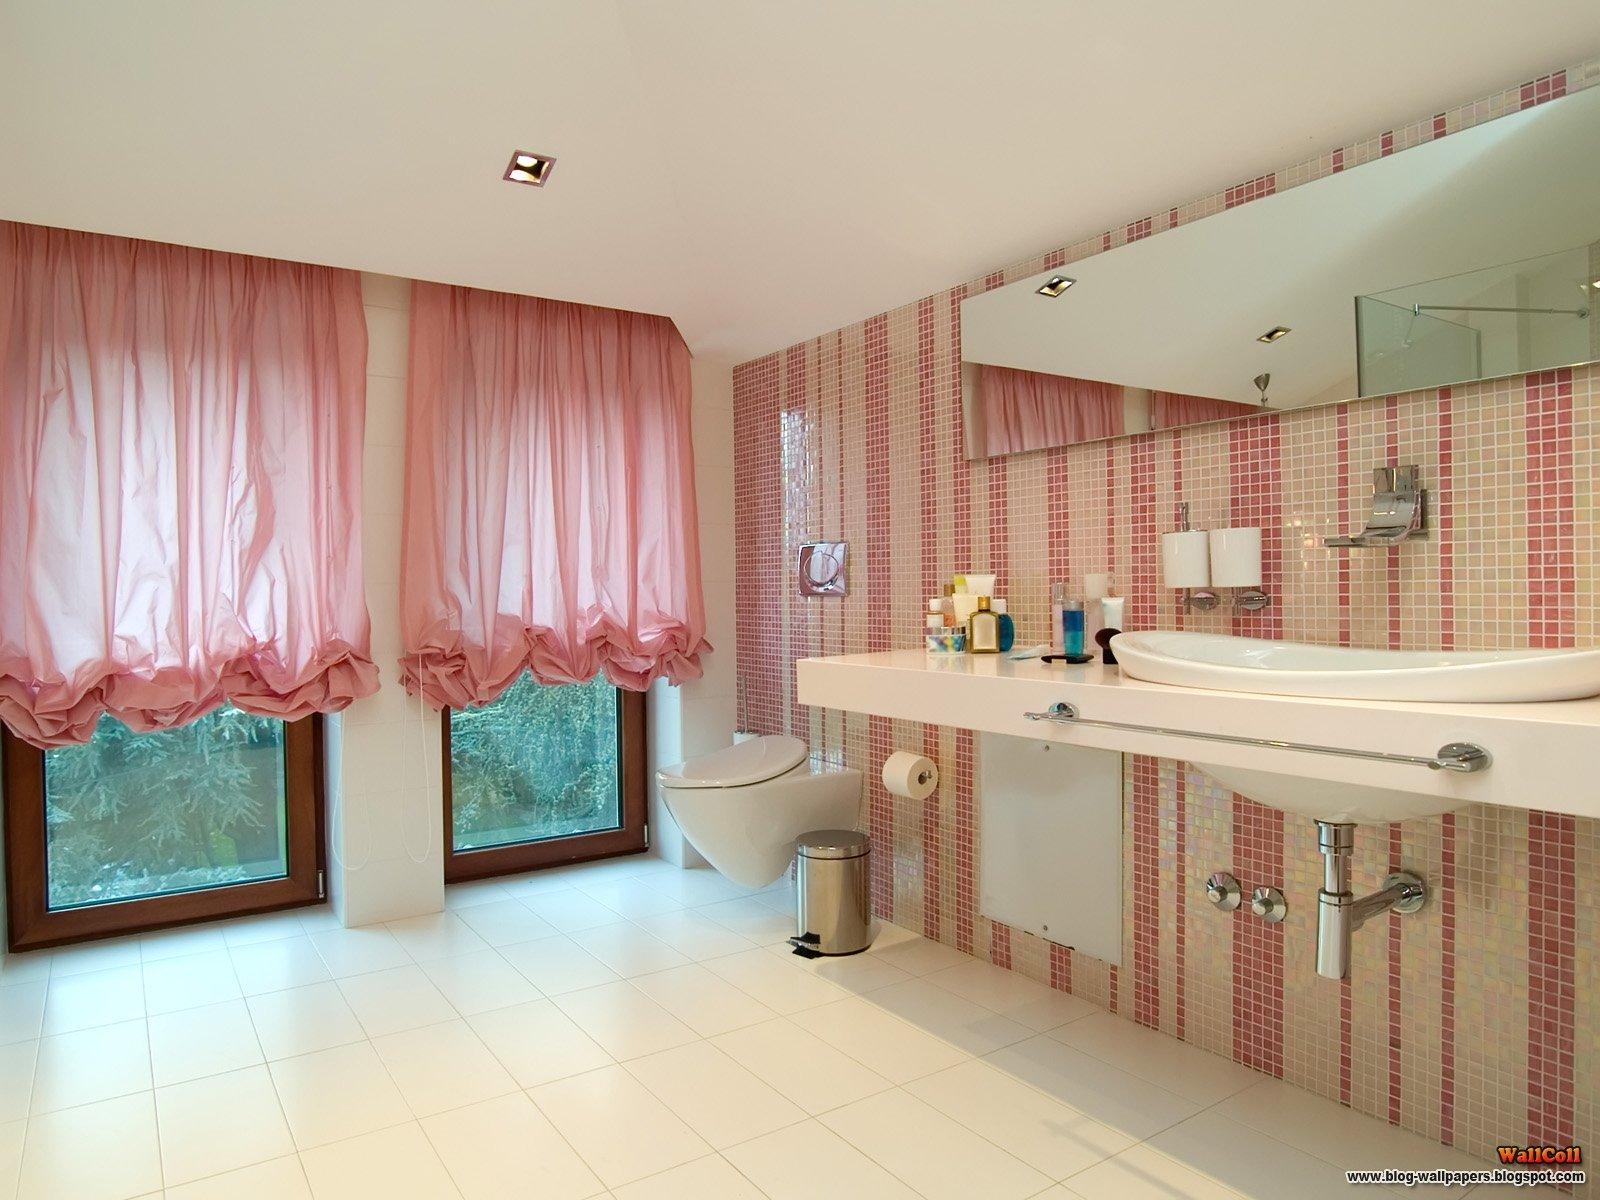 Dise o de interiores arquitectura continuaci n taringa for Diseno de ambientes interiores